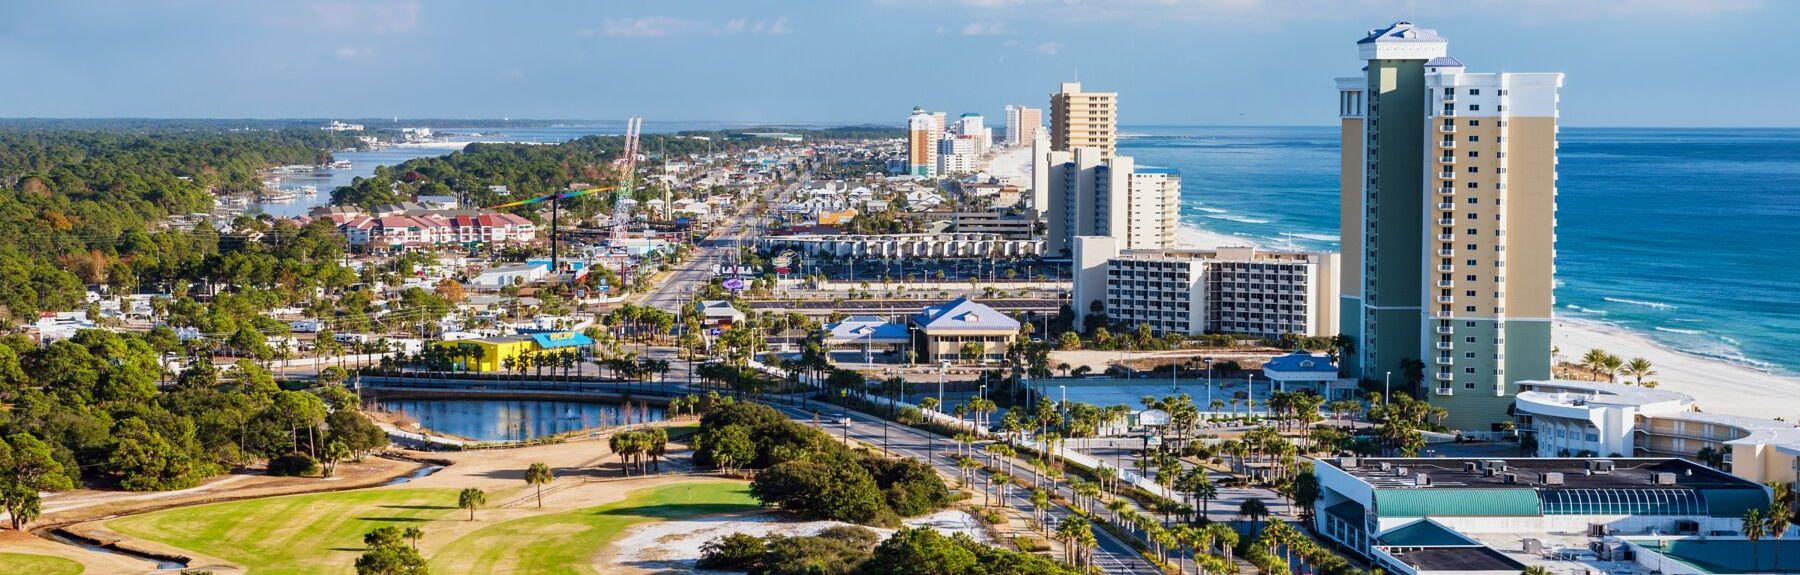 Panama City, Φλόριντα, Ηνωμένες Πολιτείες